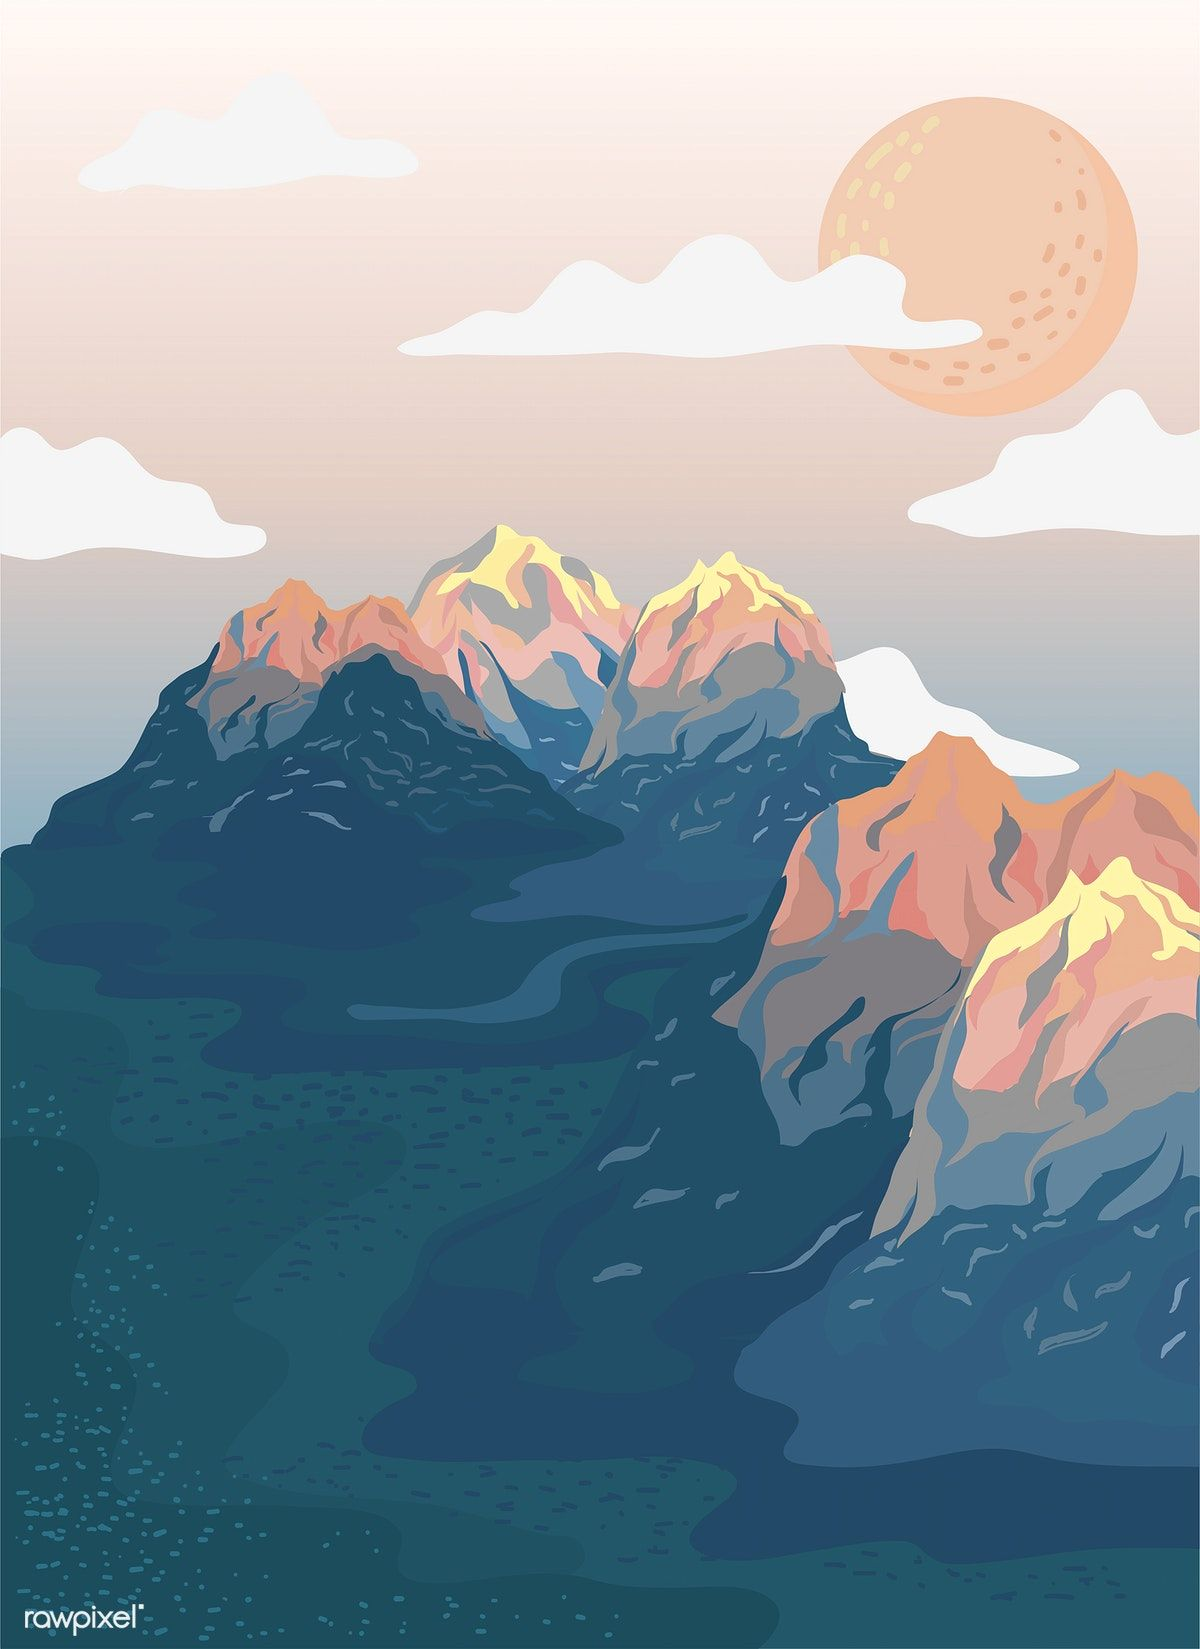 Landscape Illustration Vector Free: Painted Mountain View Landscape Illustration